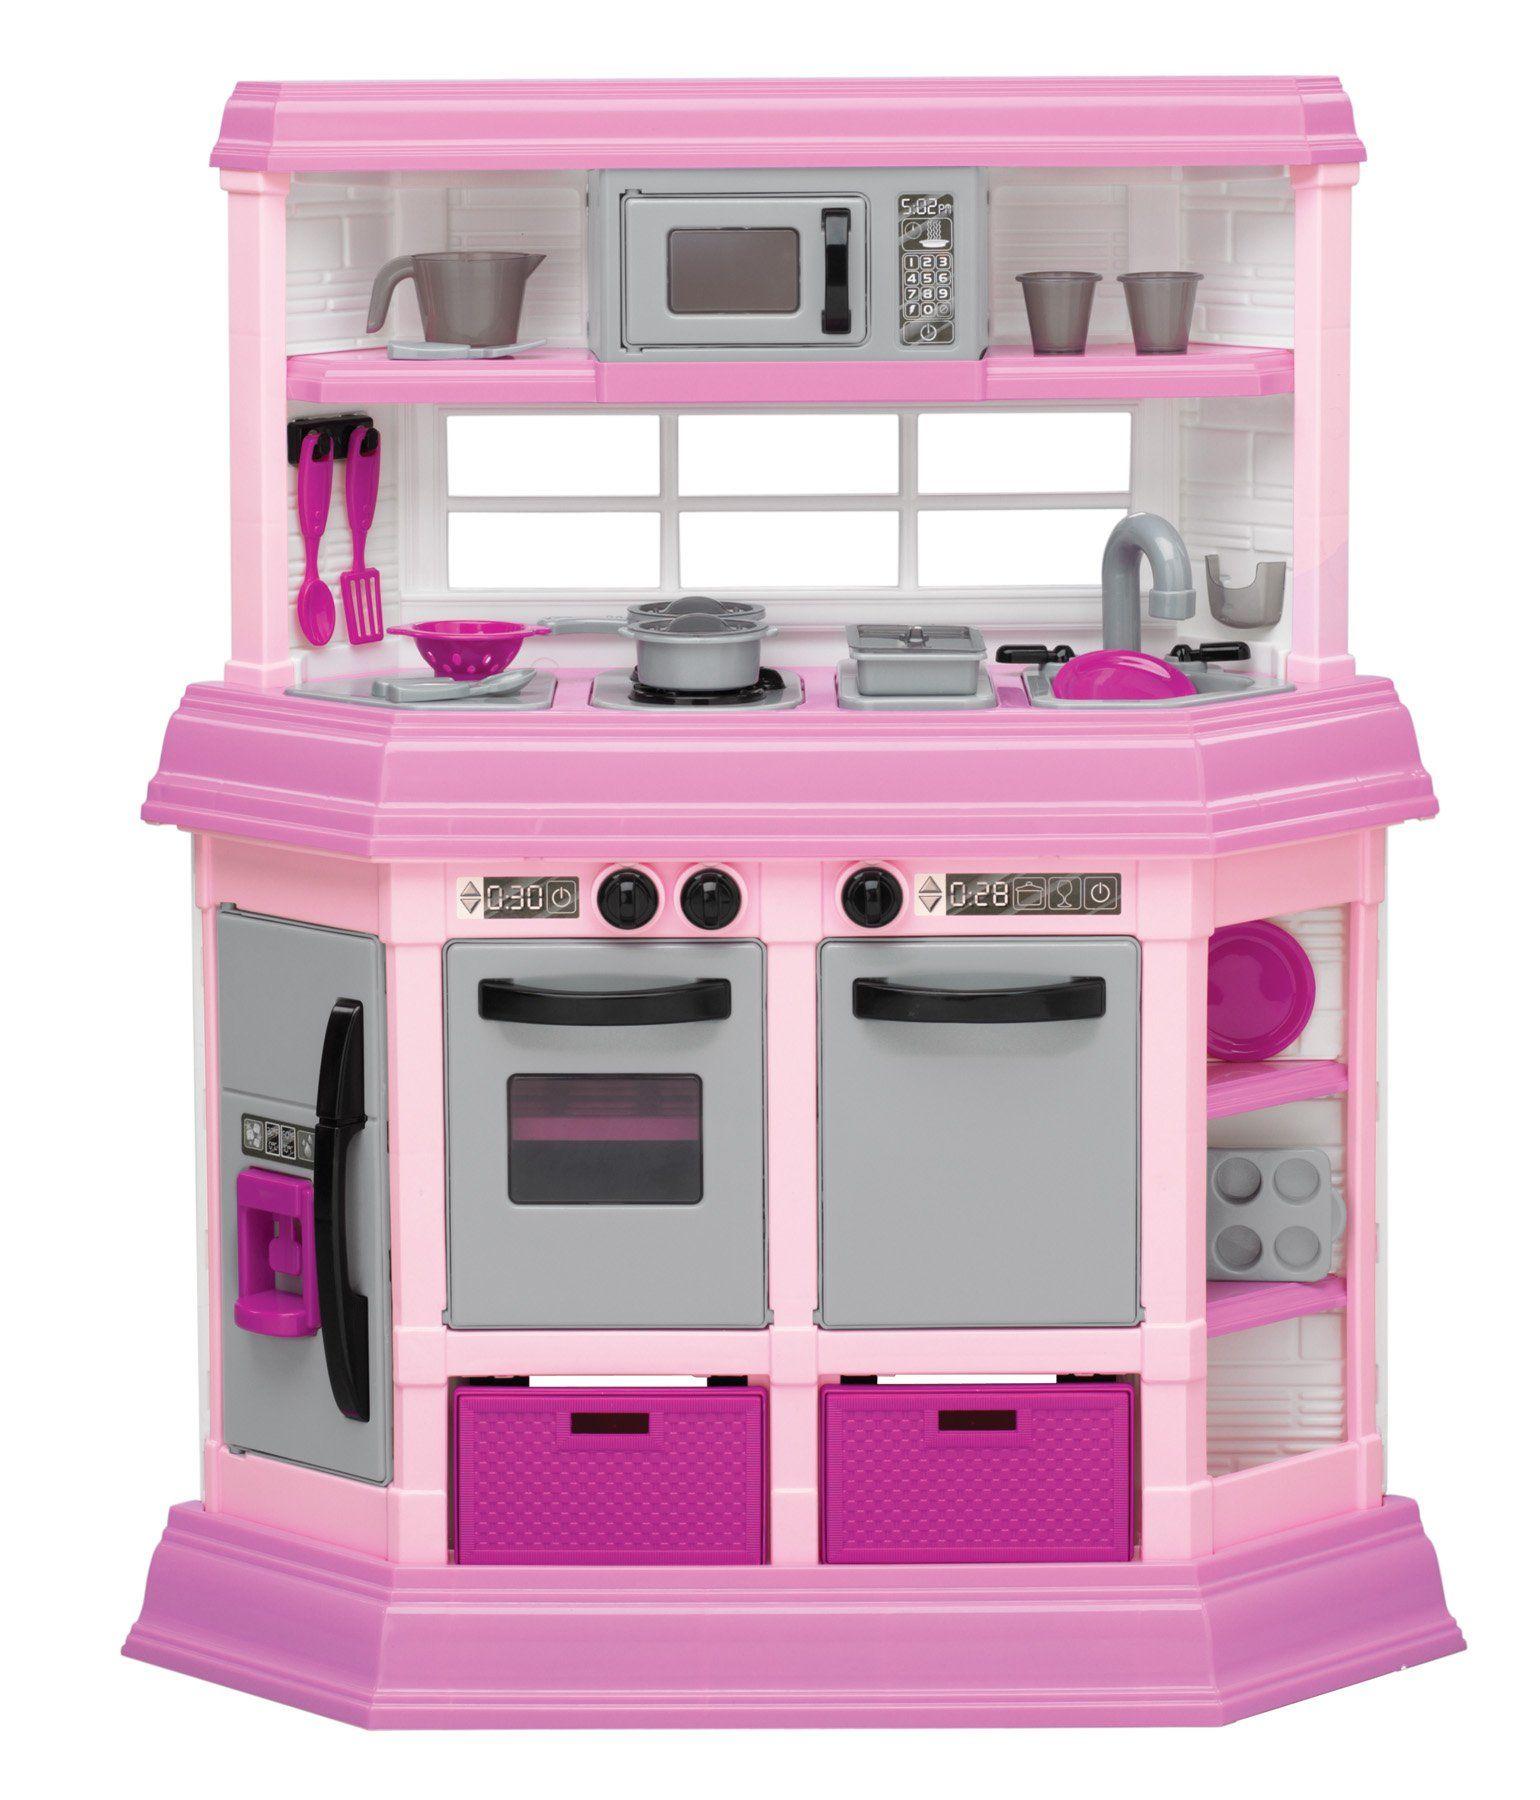 fba7c03363b9 American Plastic Toy Deluxe Custom Kitchen